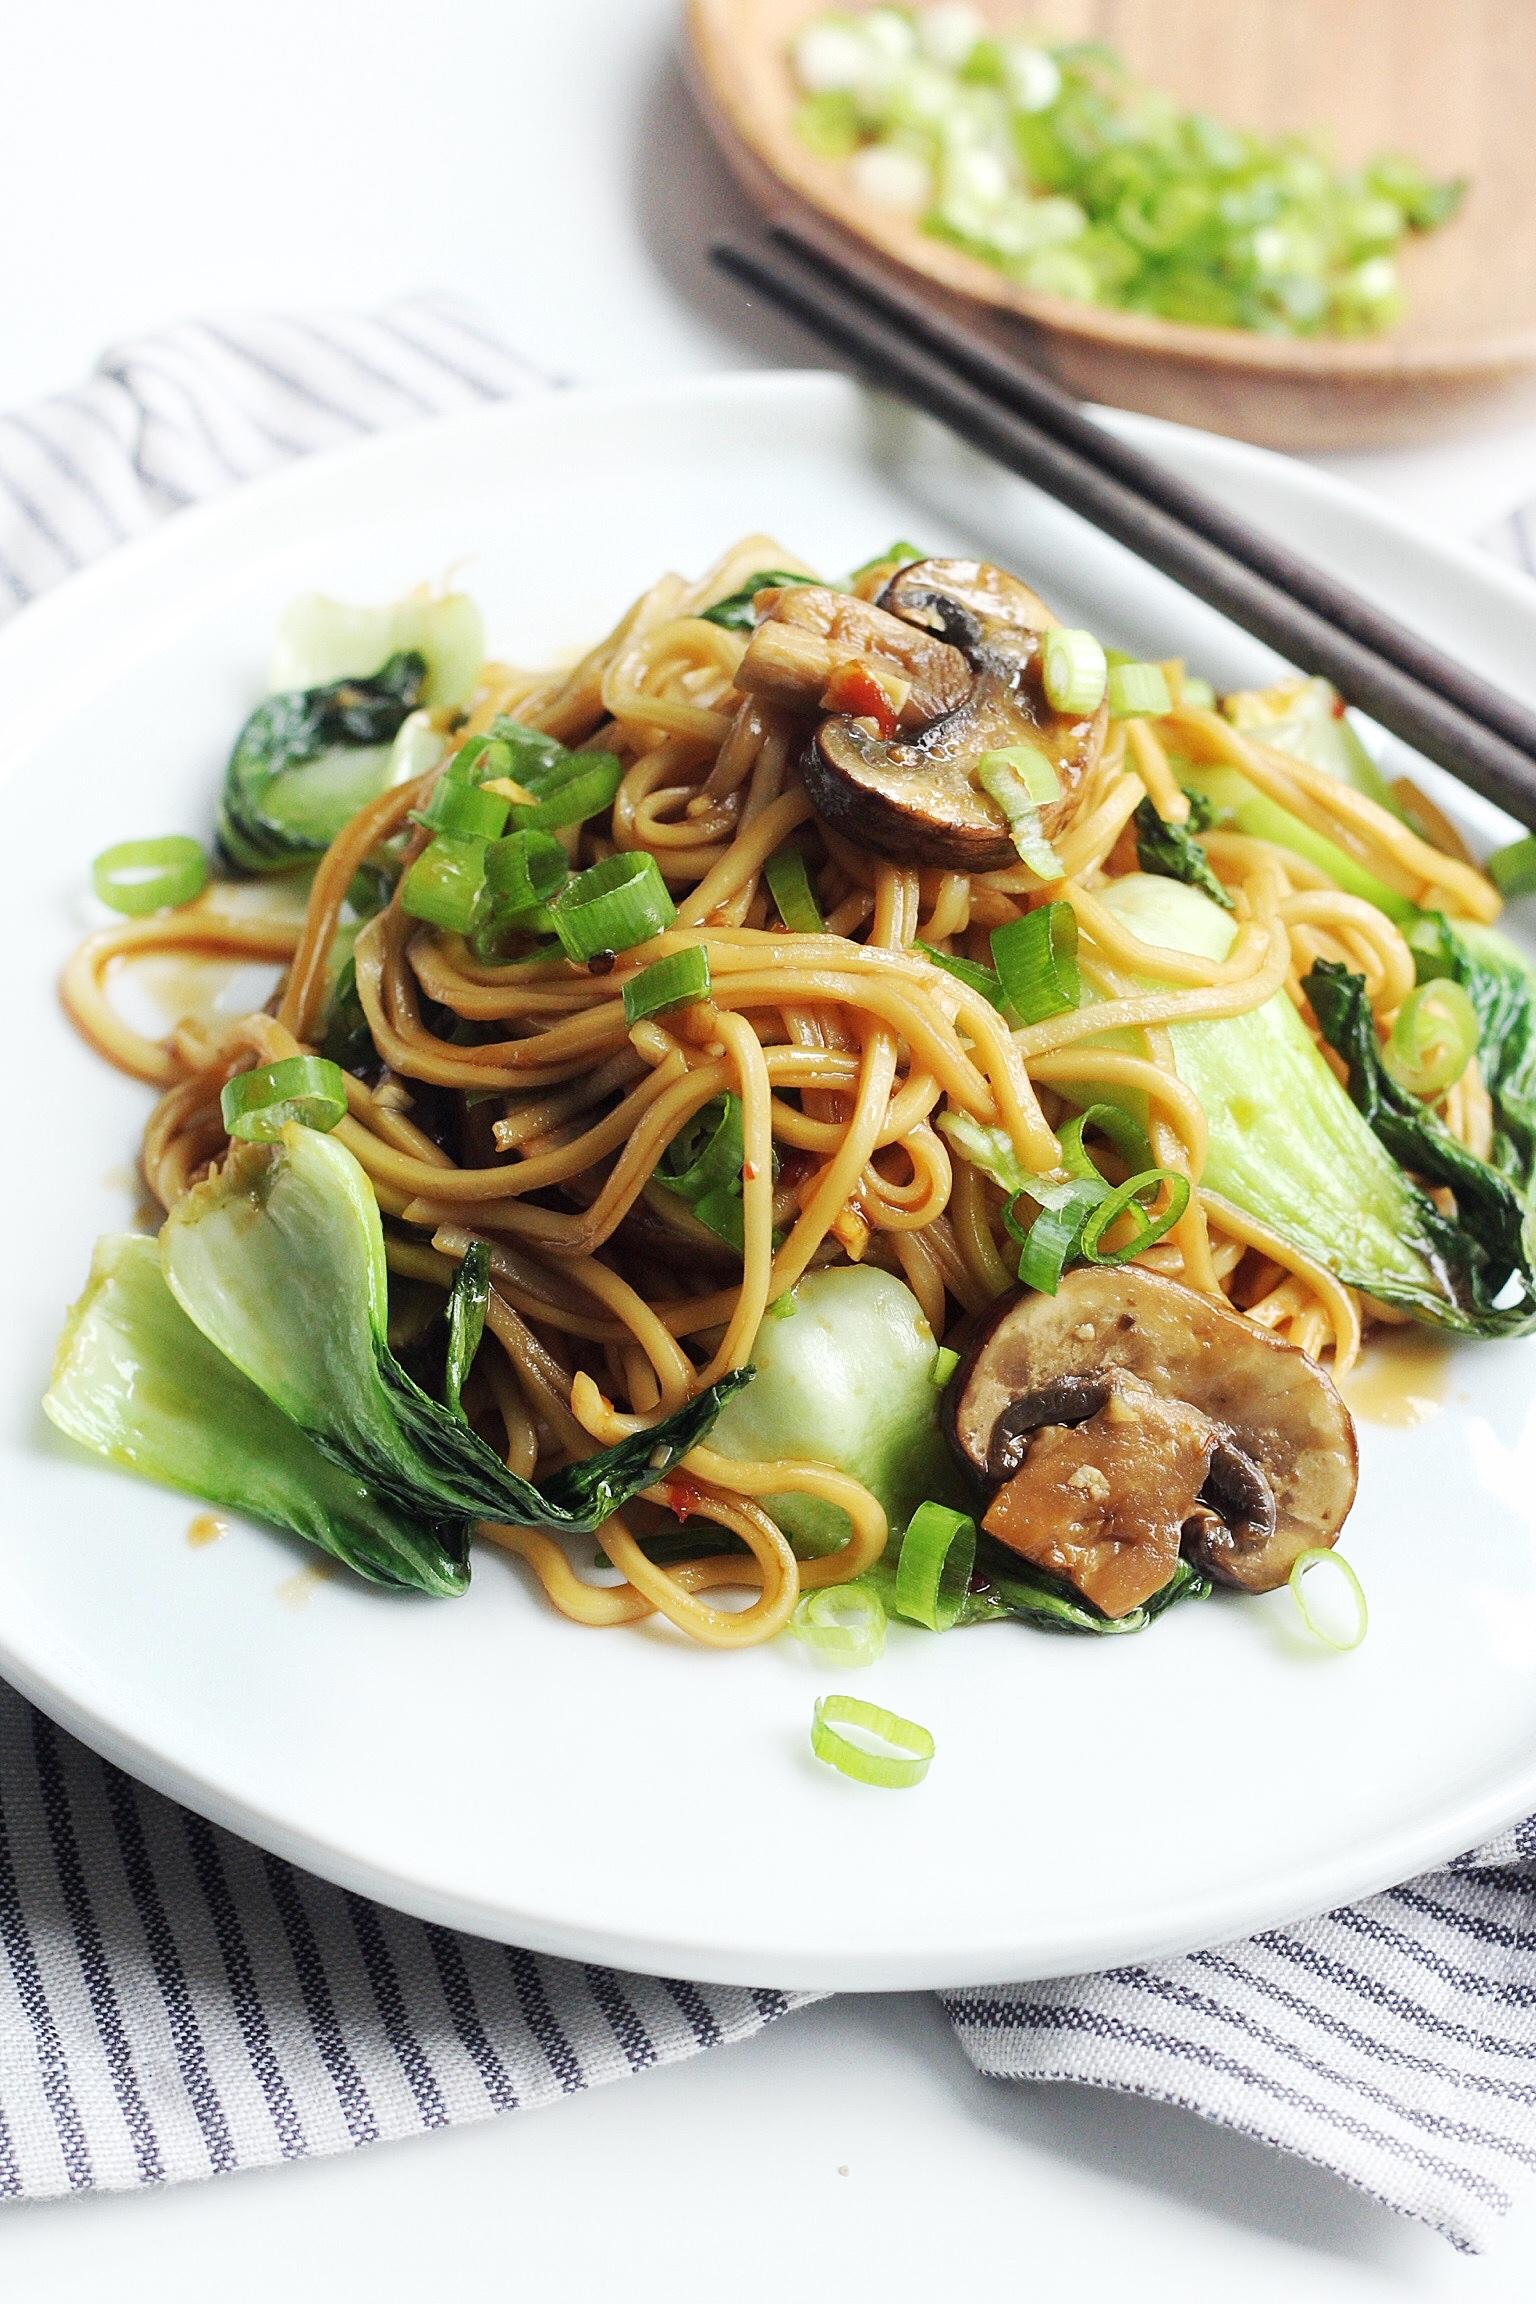 Easy Asian Garlic Sesame Noodles